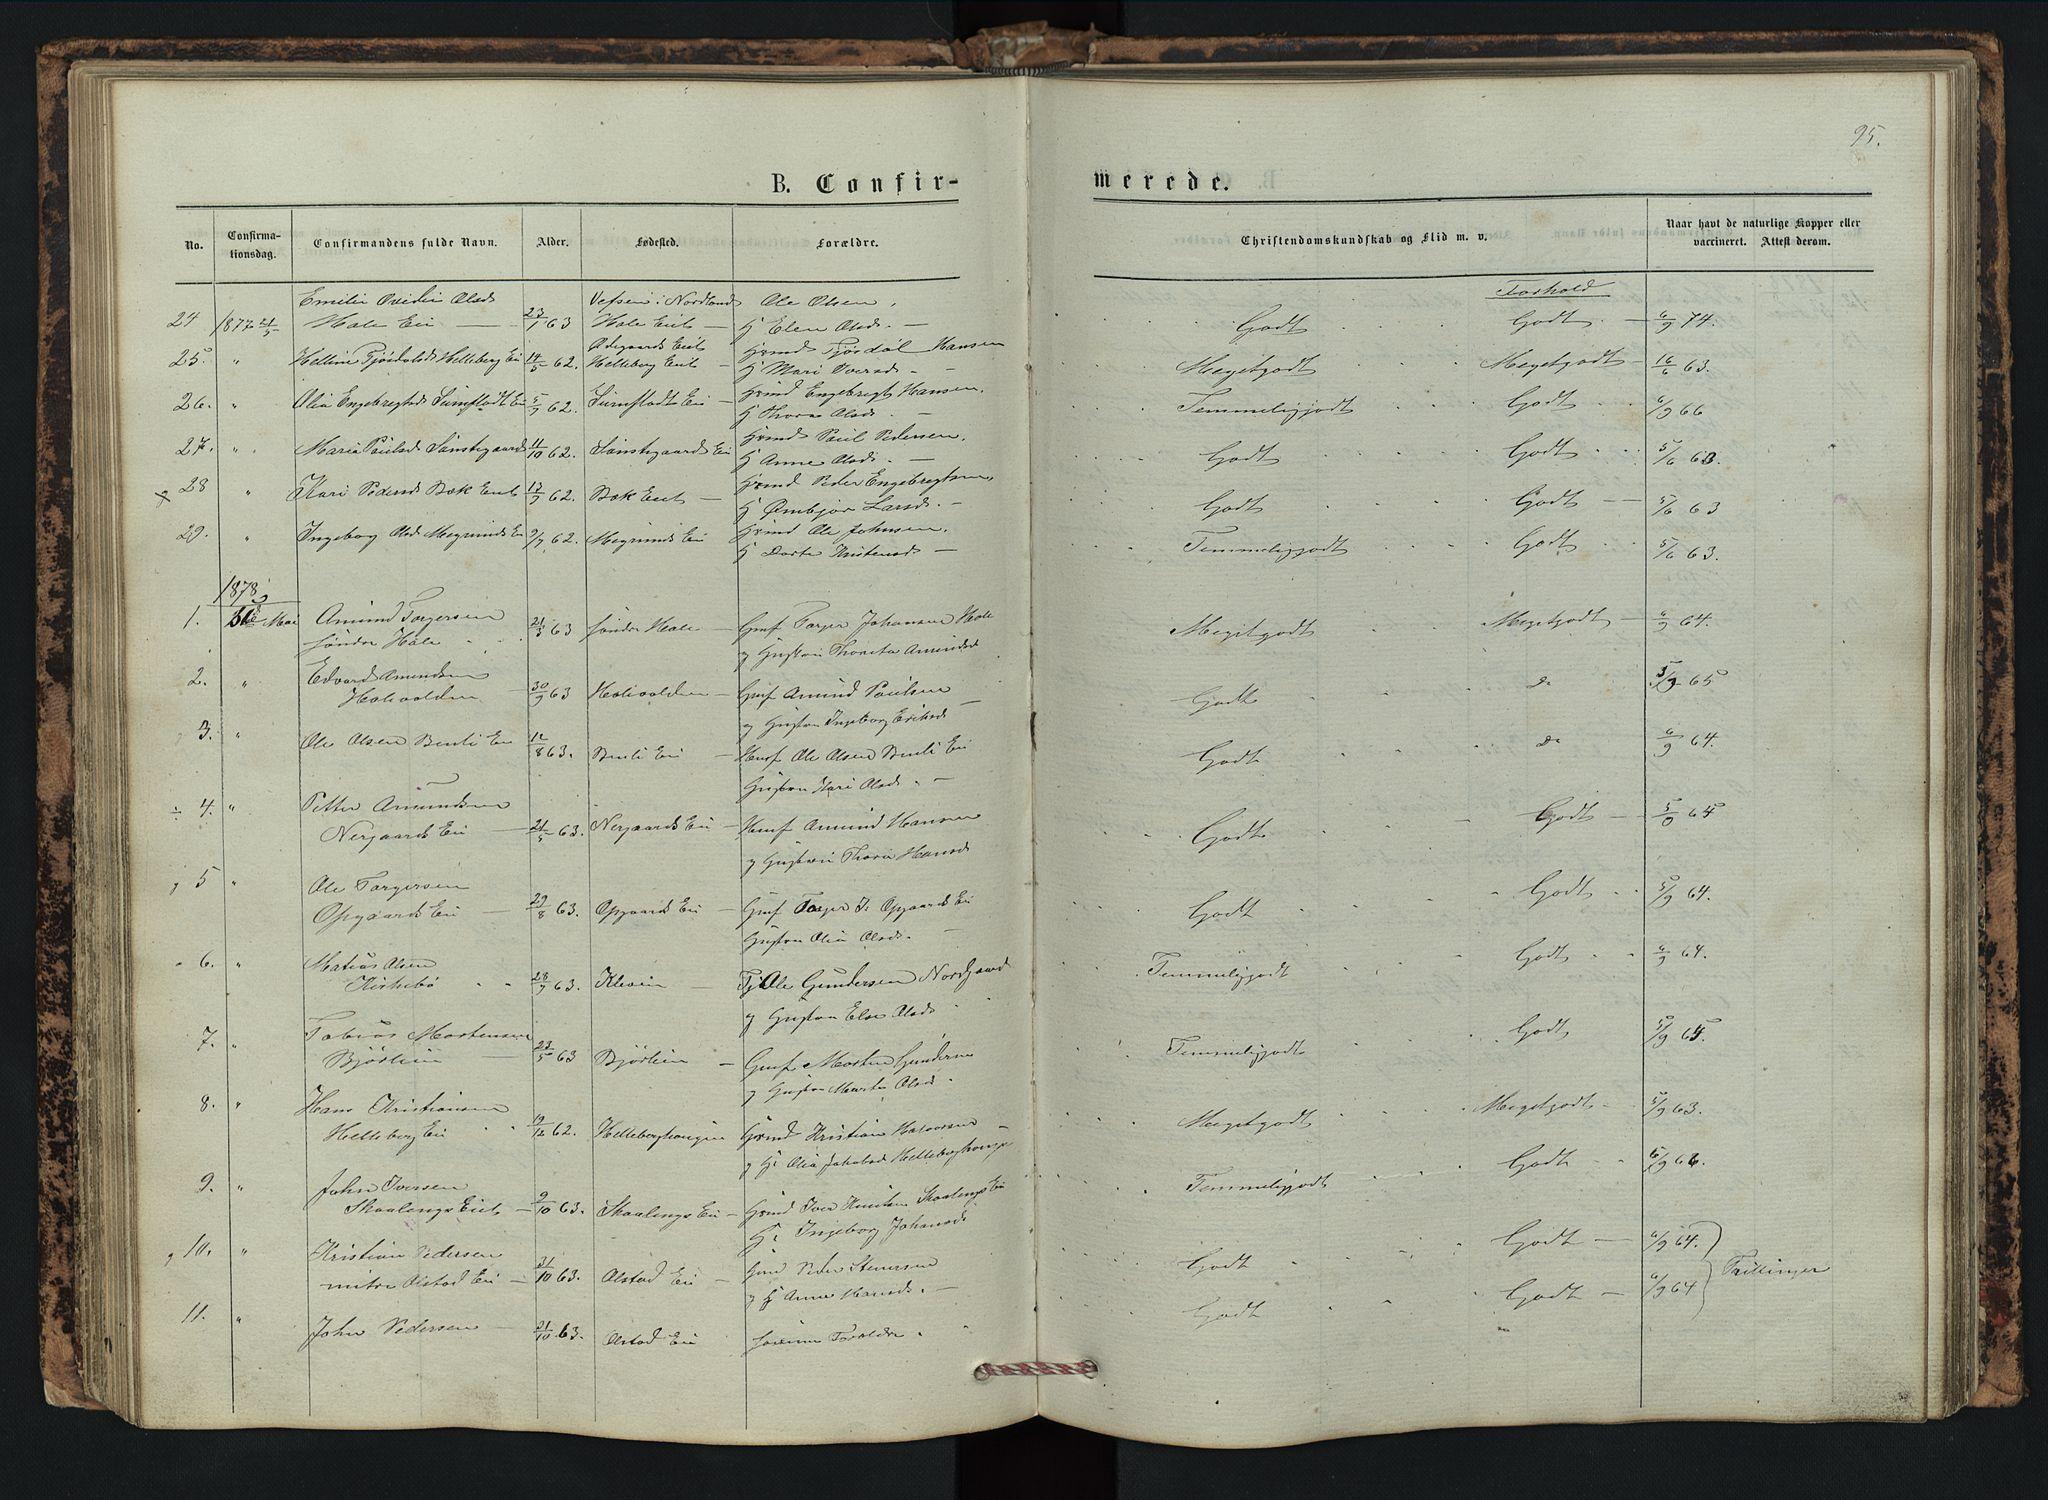 SAH, Vestre Gausdal prestekontor, Klokkerbok nr. 2, 1874-1897, s. 95